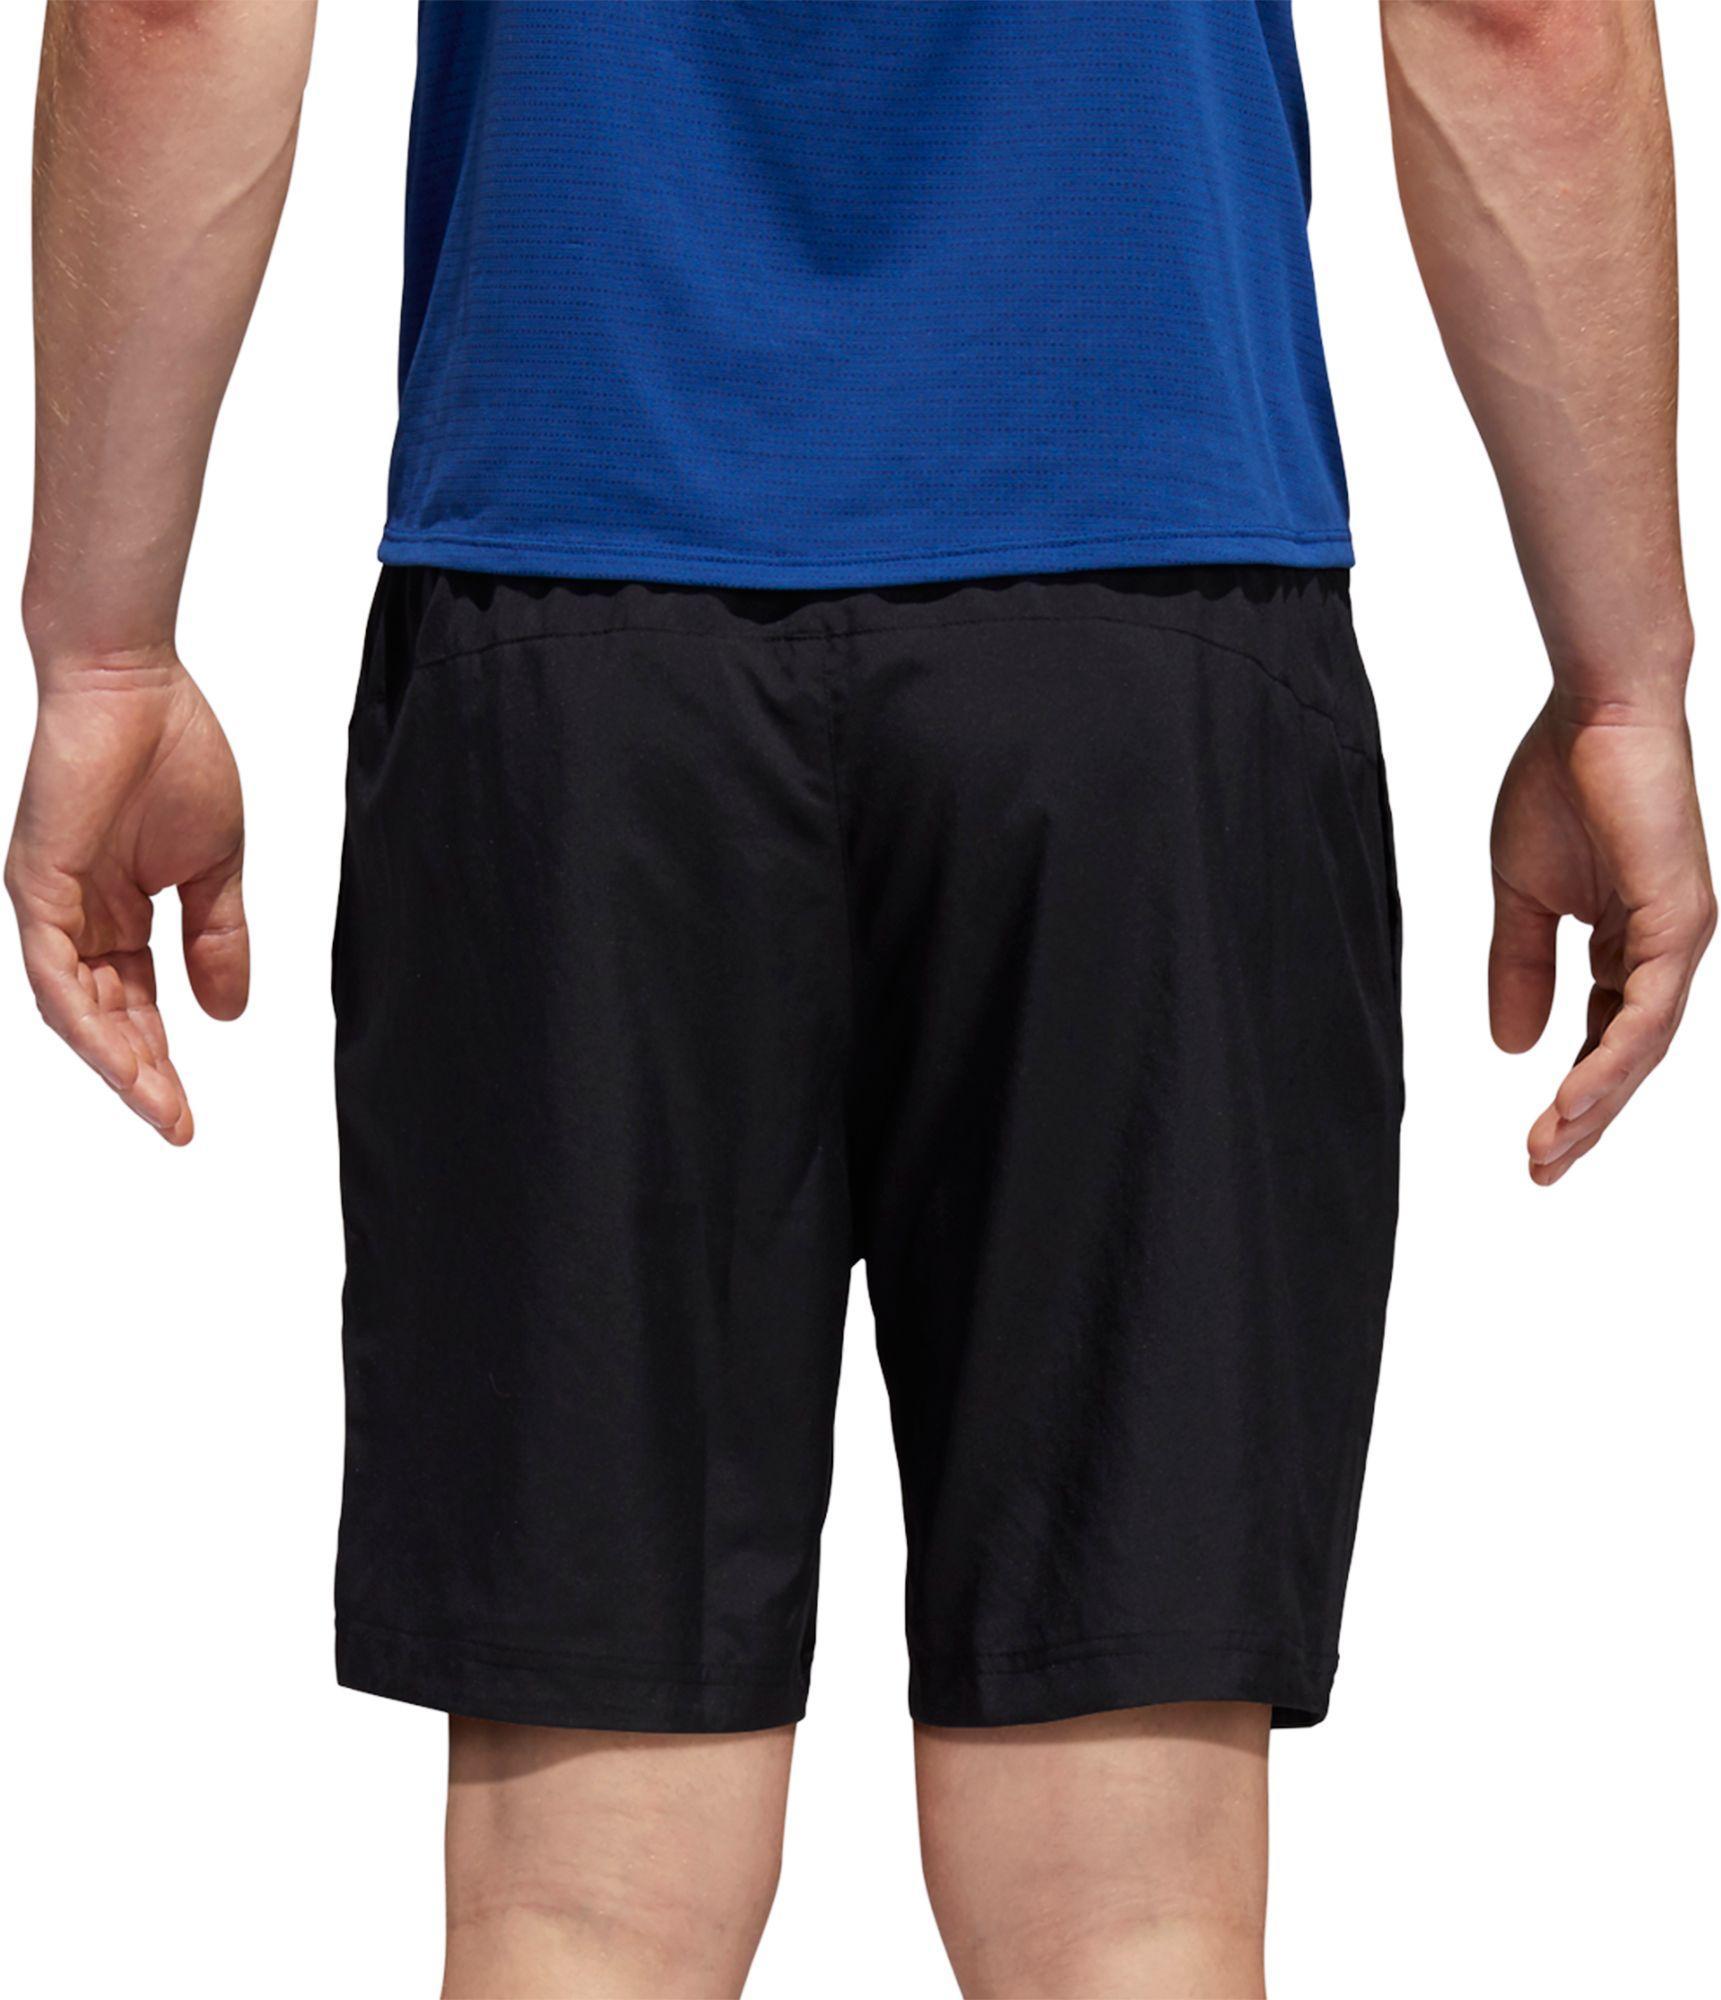 9e197b6fbd6df Lyst - adidas Run-it 5'' Lined Running Shorts in Black for Men